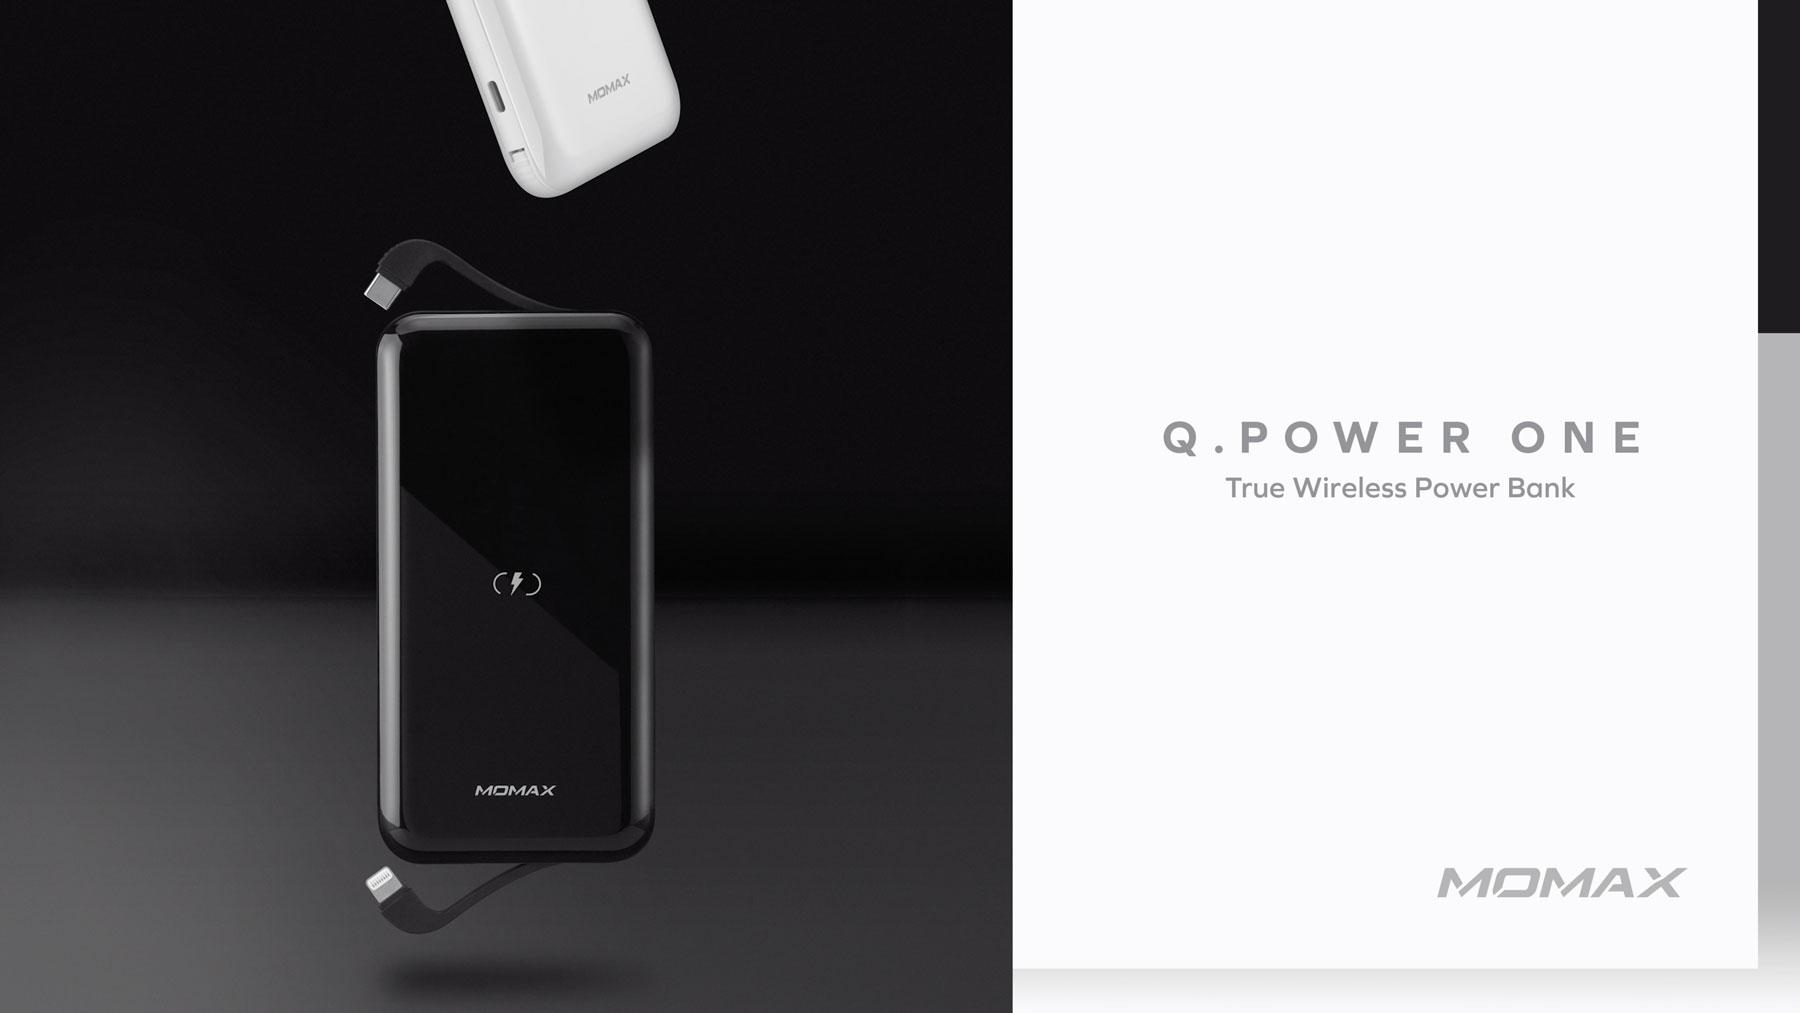 Momax Q. Power One Dual Wireless External Battery Pack: Q Power One True Wireless Power Bank